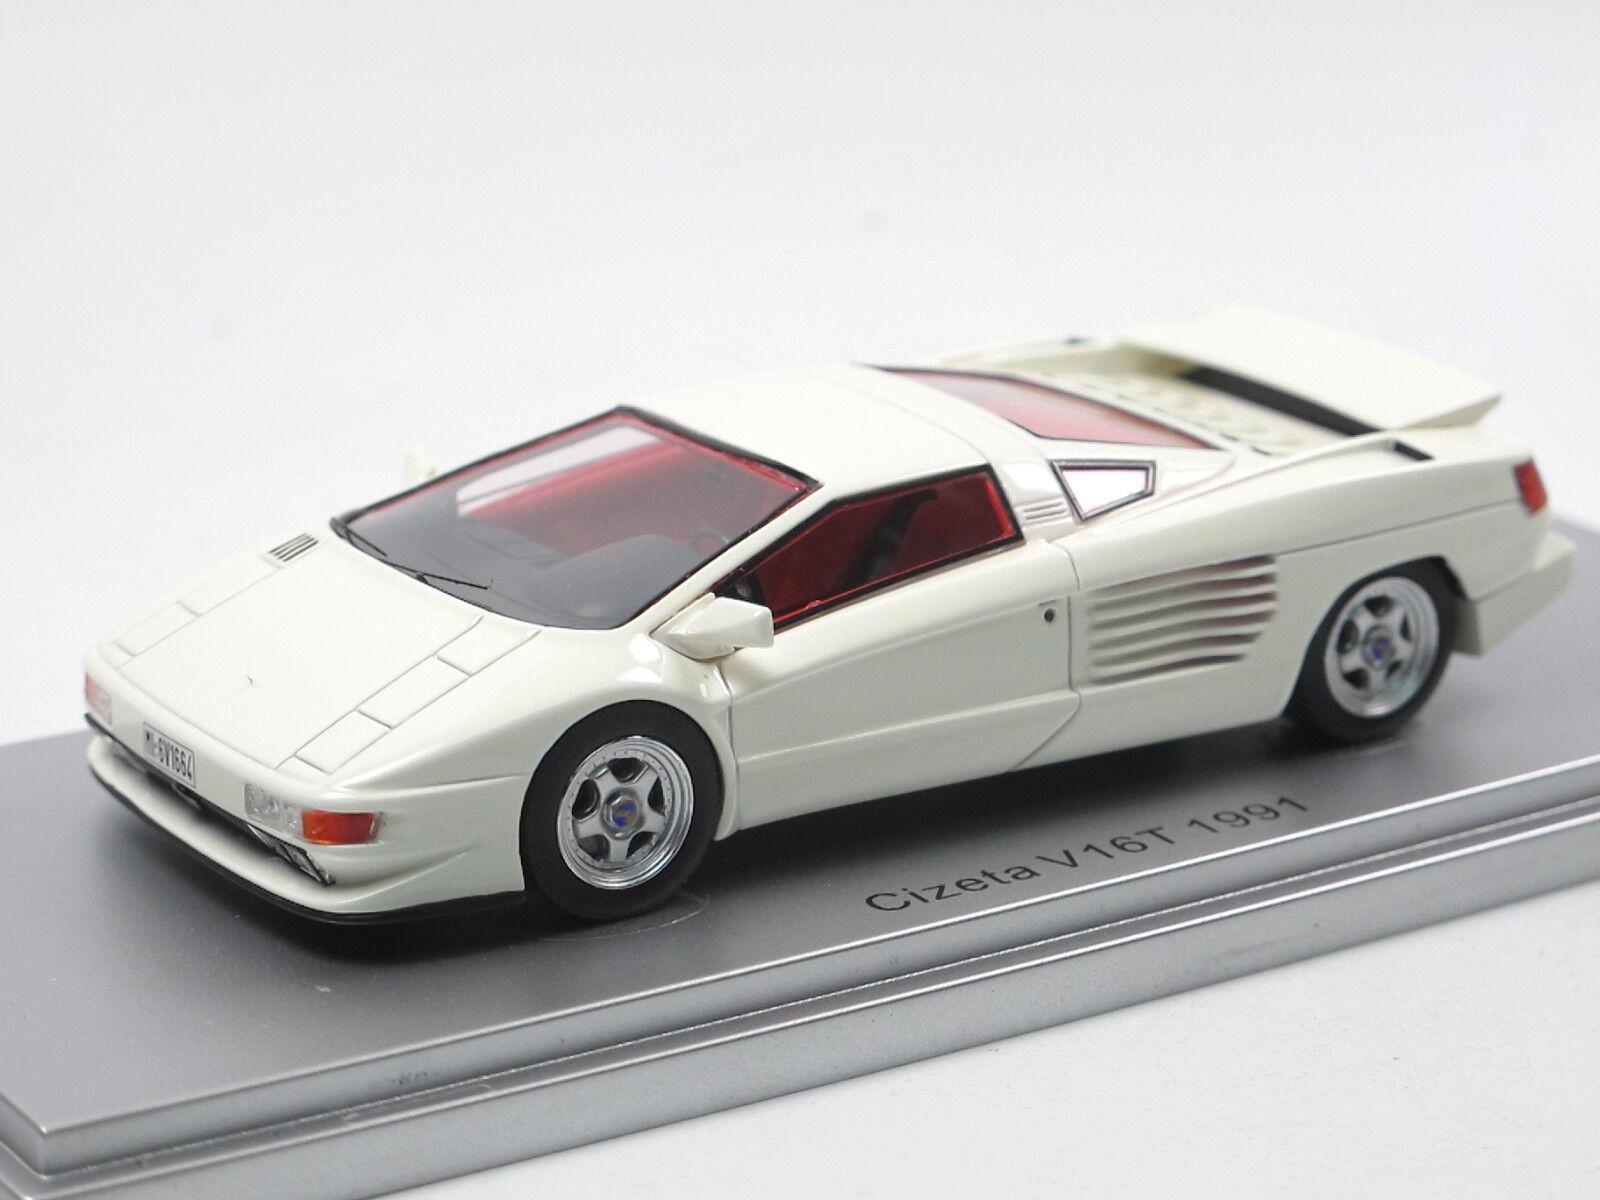 Kess modellen ke43048001 1991 cizeta v16t weißen 1   43 limited edition neuheit